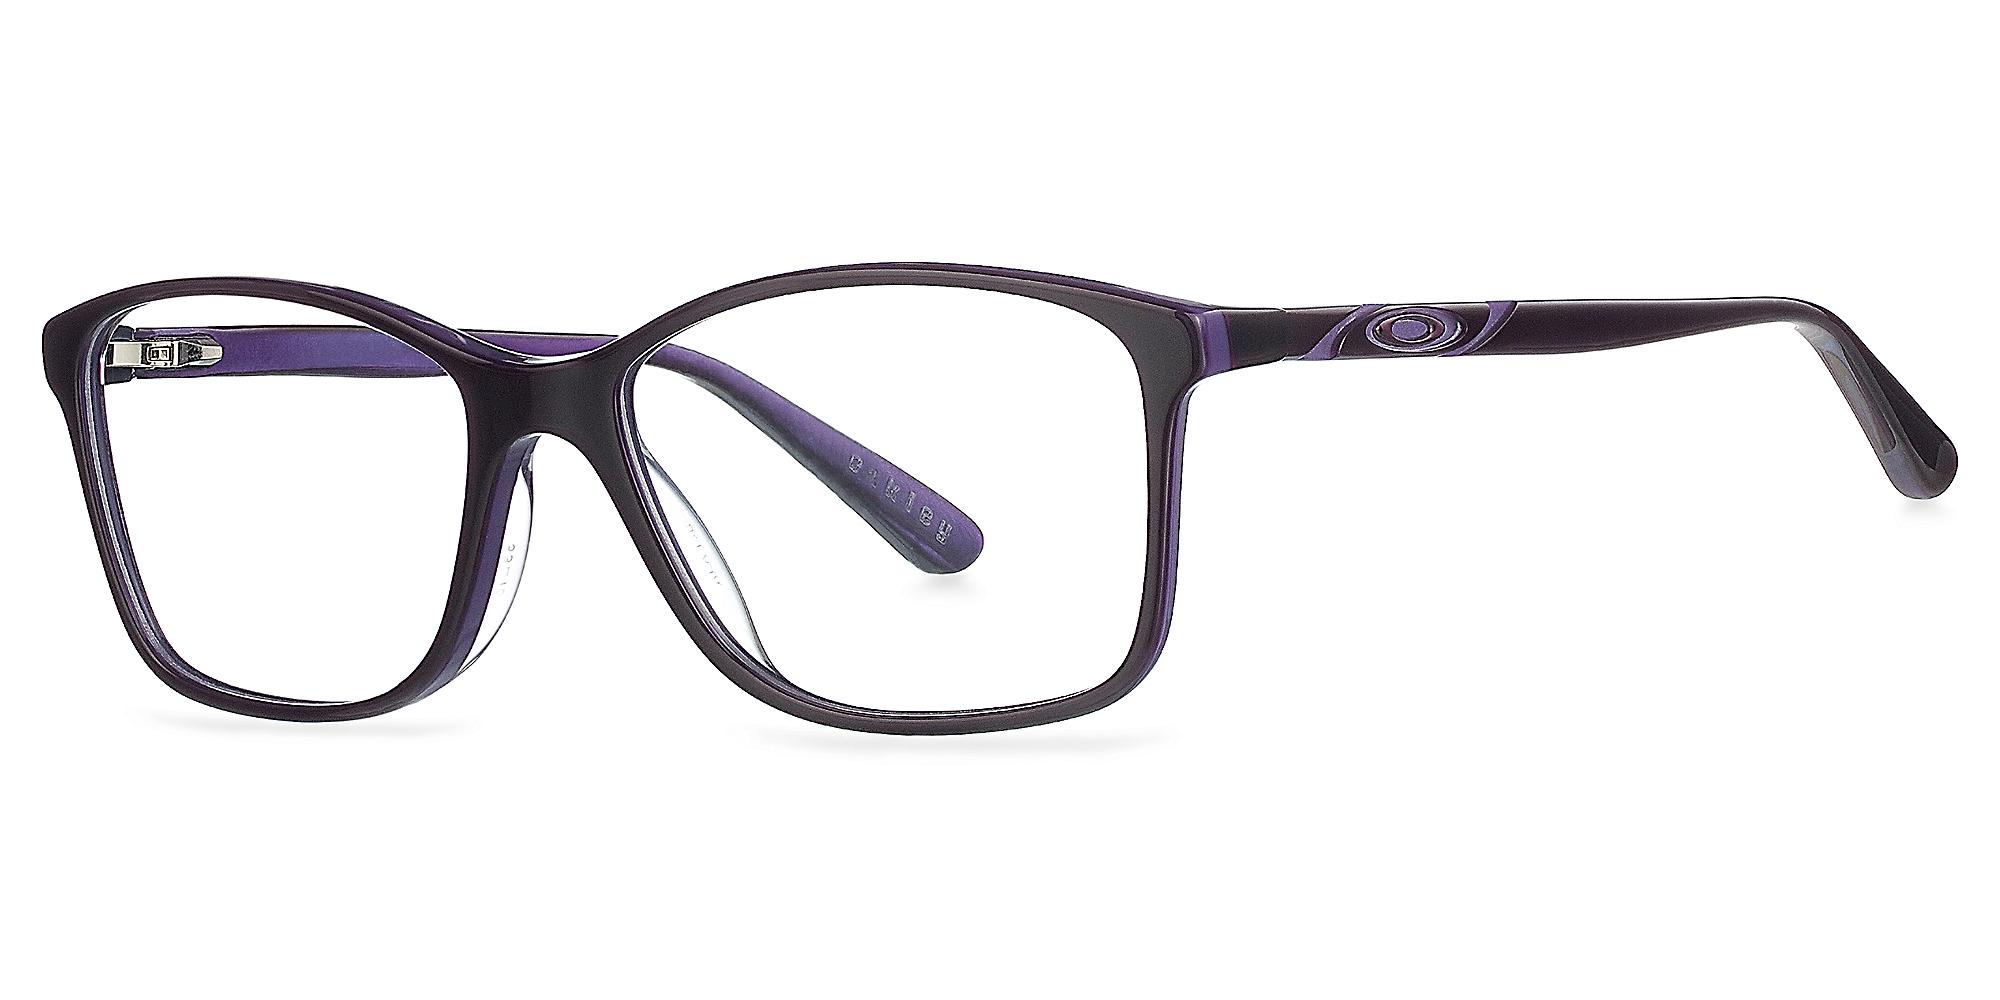 order oakley prescription glasses online yixl  order oakley prescription glasses online